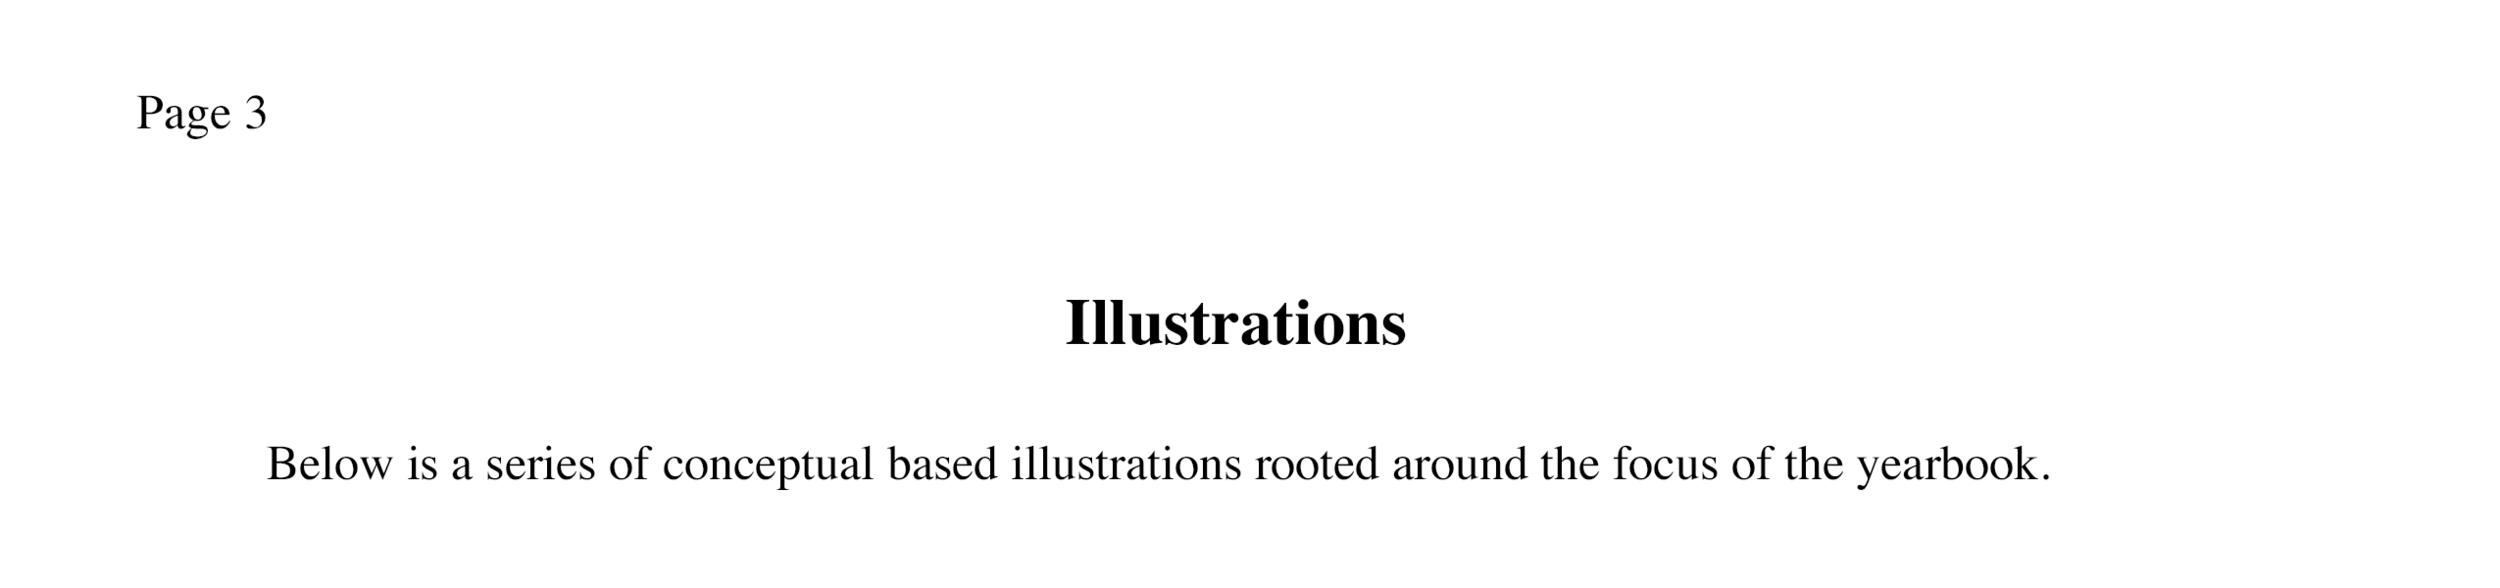 illustrationssenior.png